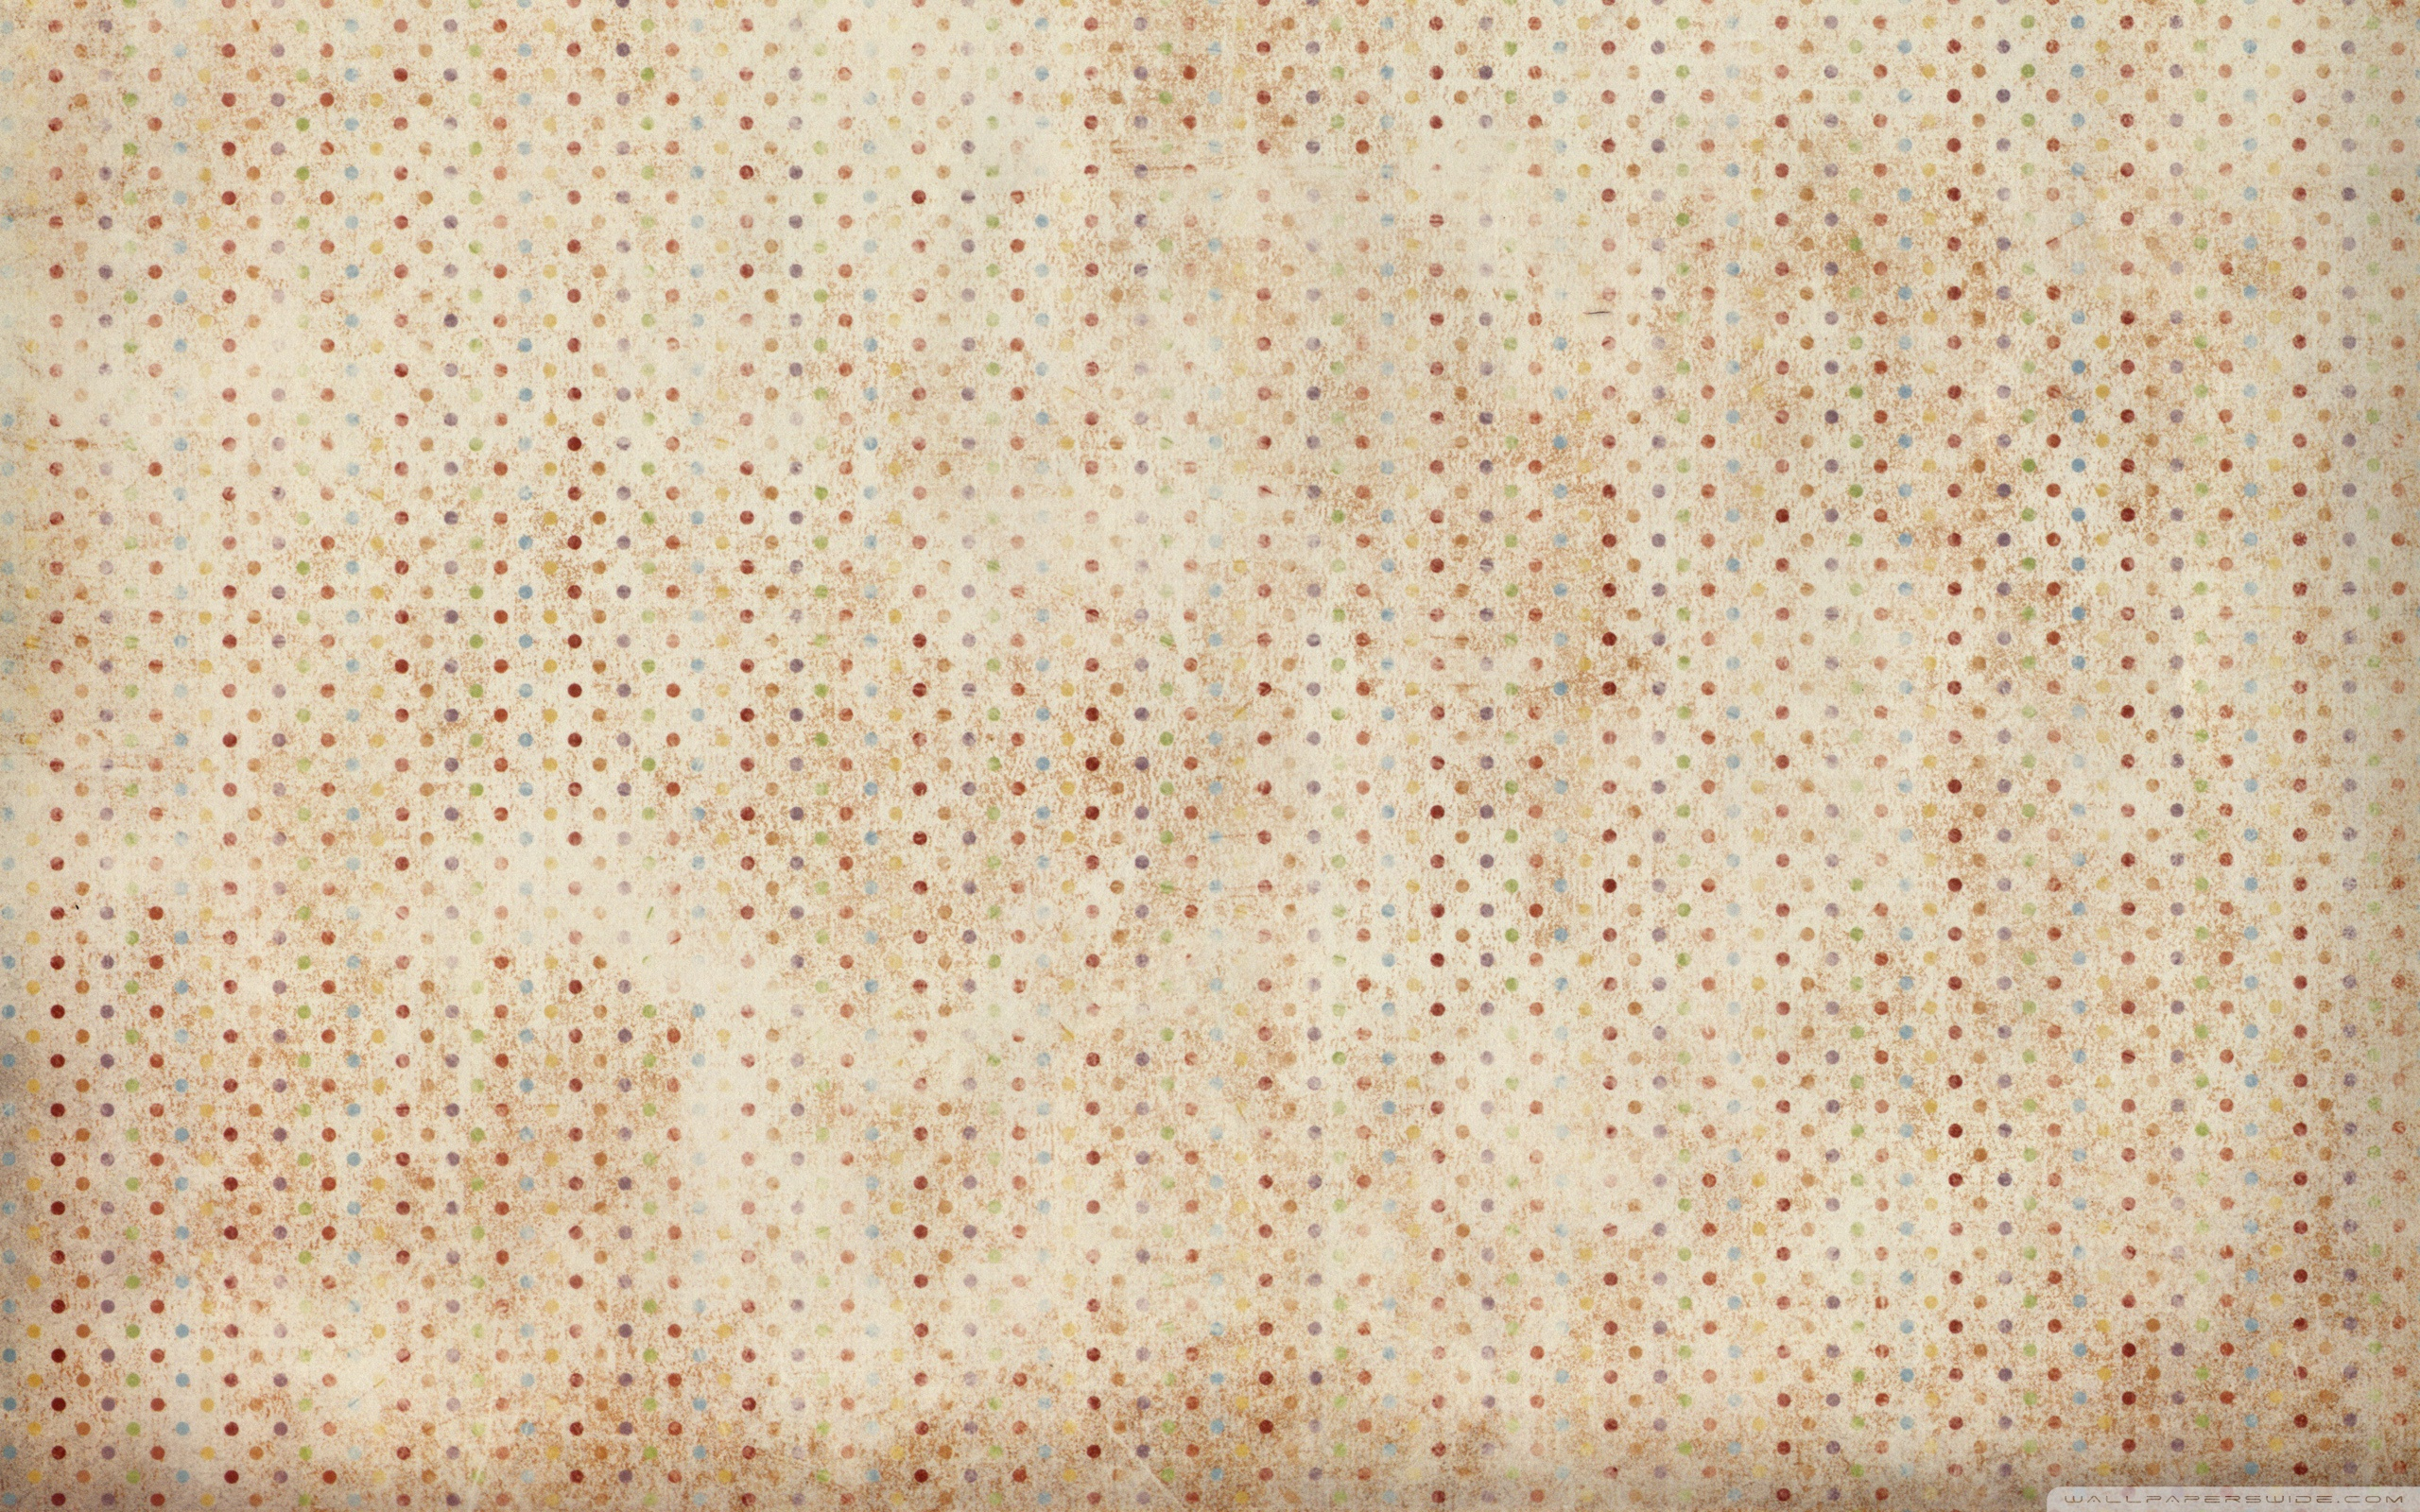 Halloween Vintage Texture | VIP Wallpaper | HD Wallpapers for ...